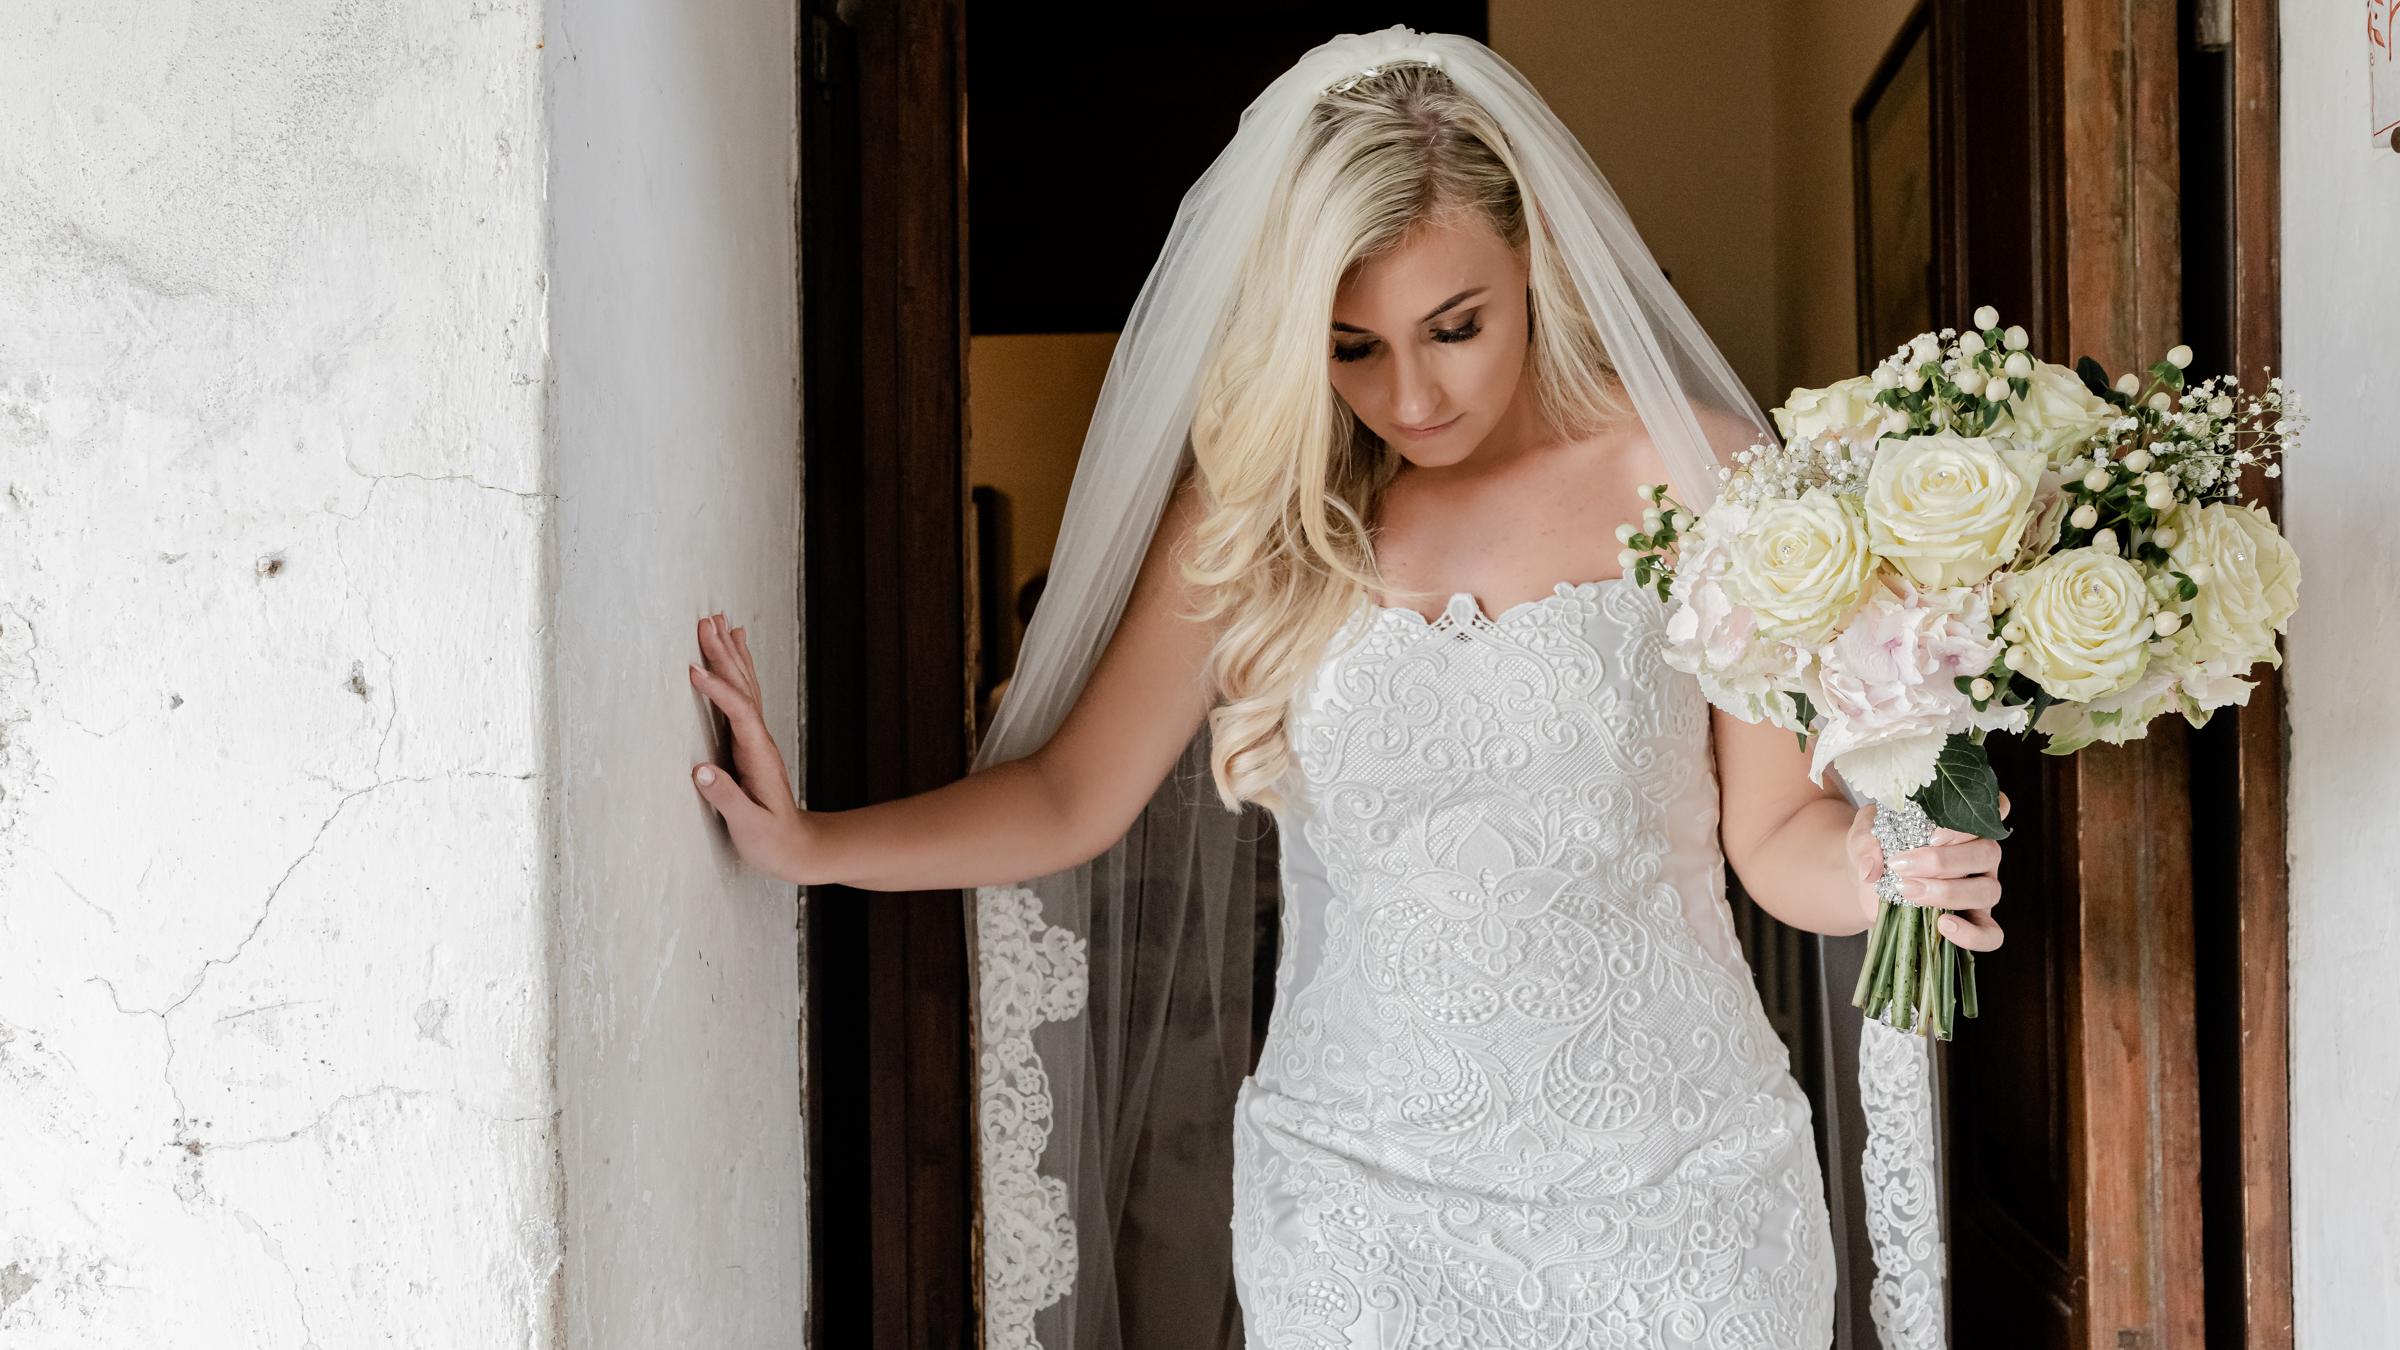 Borgo di tragliata Wedding-11.jpg